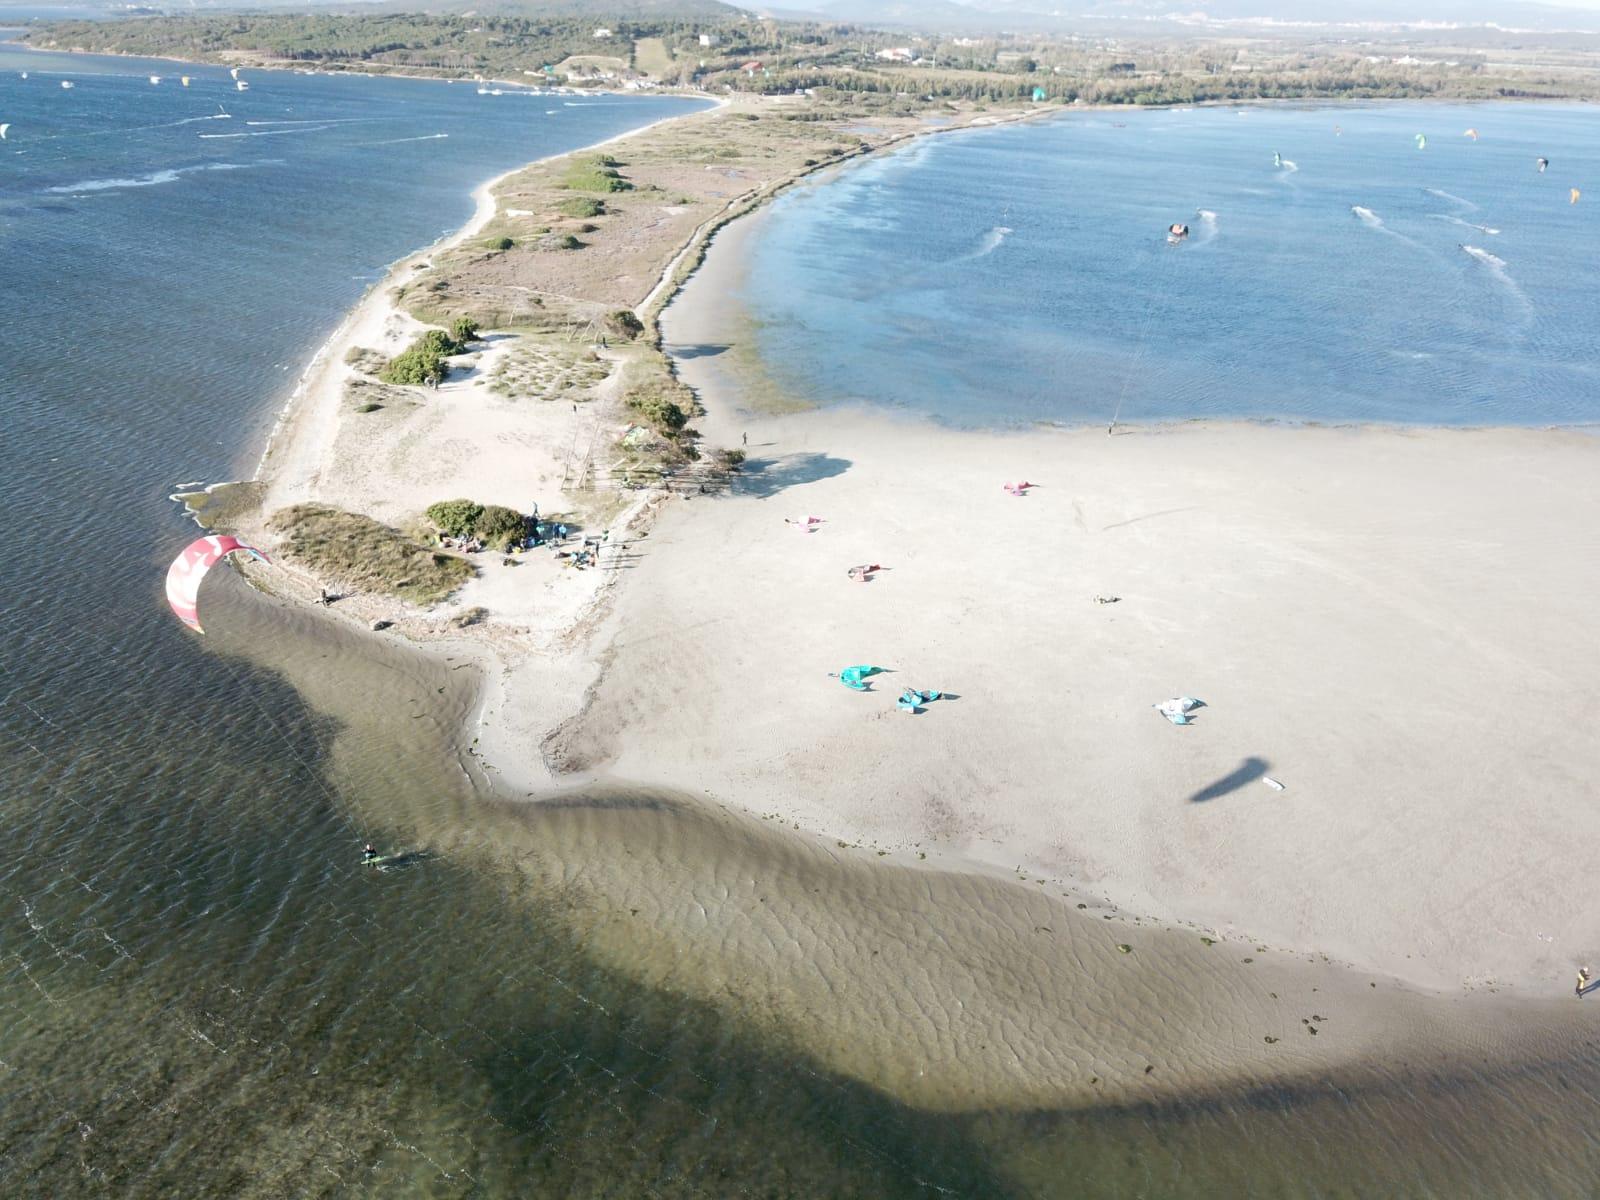 Punta Trettu Kite Beach in Sardinia, perfect with Shallow Water and Flat Water